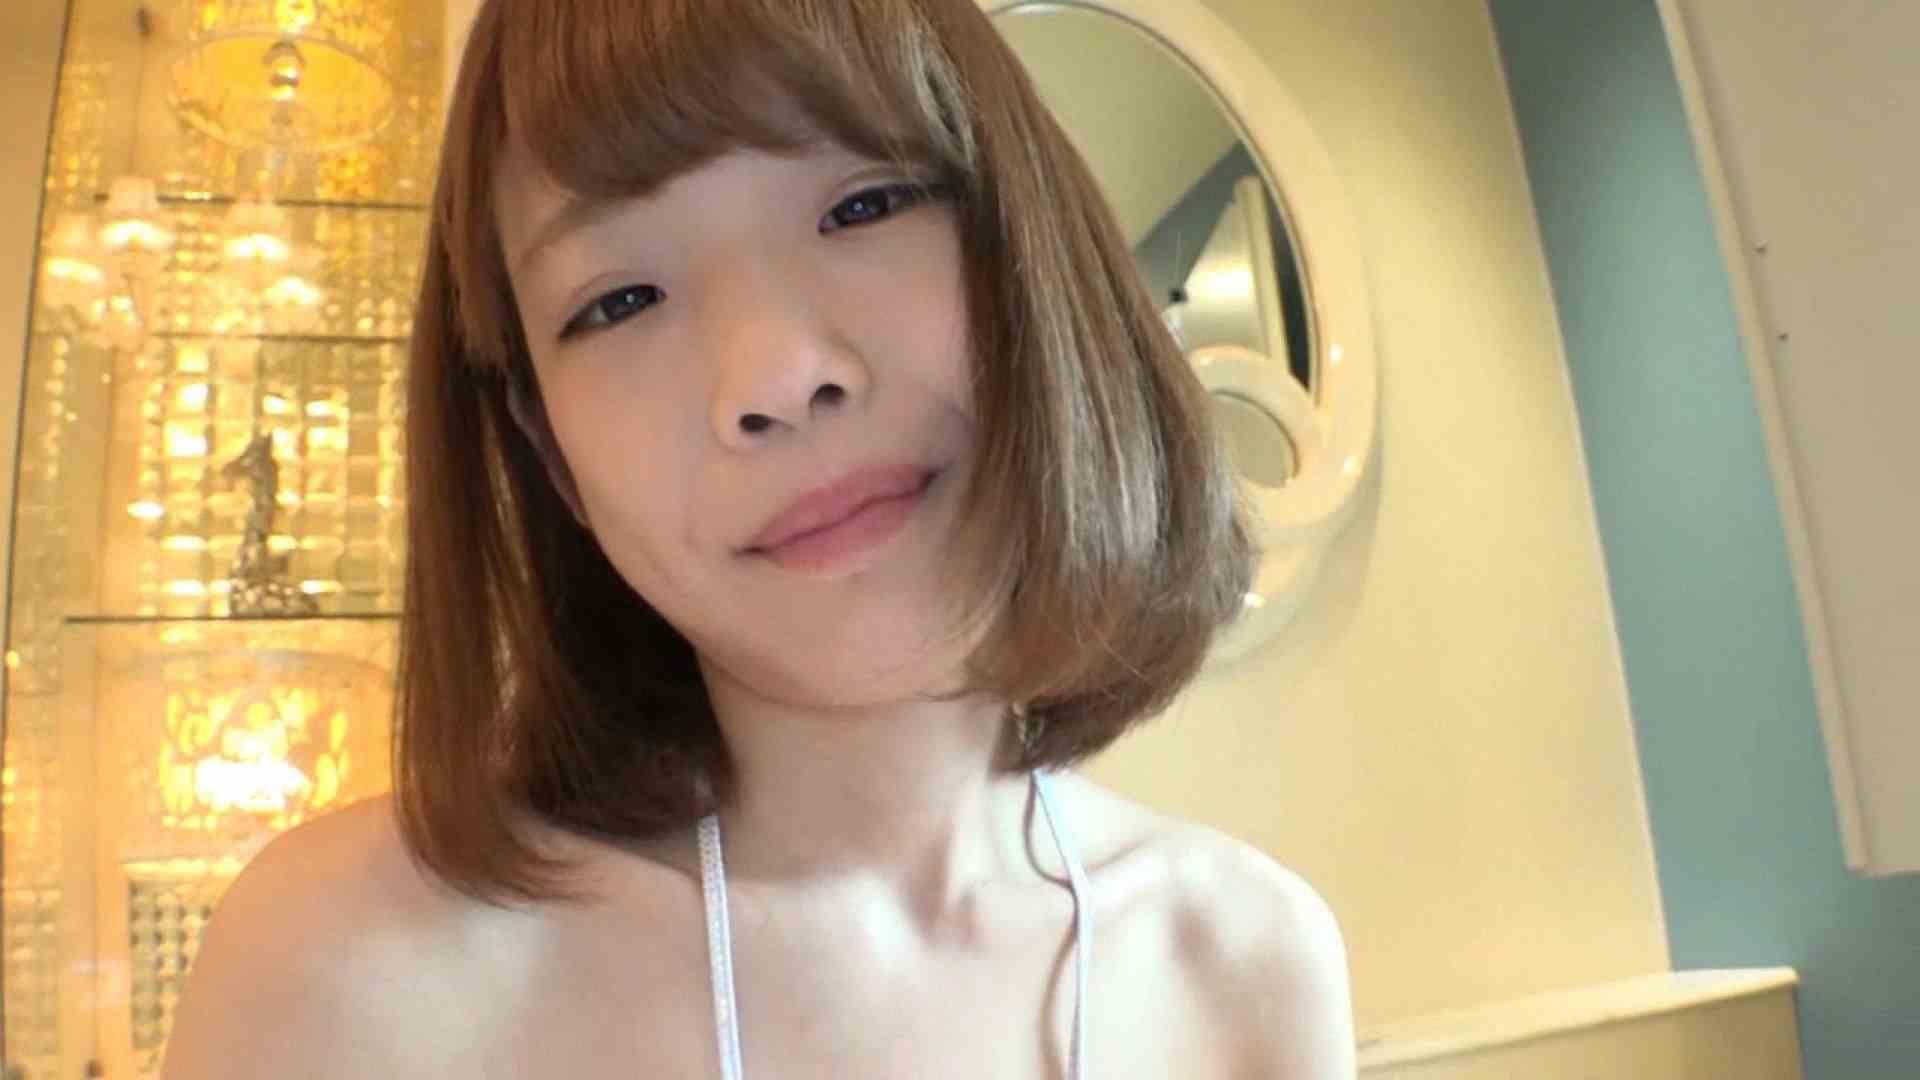 S級厳選美女ビッチガールVol.32 前編 美女 | ギャルライフ  58pic 54